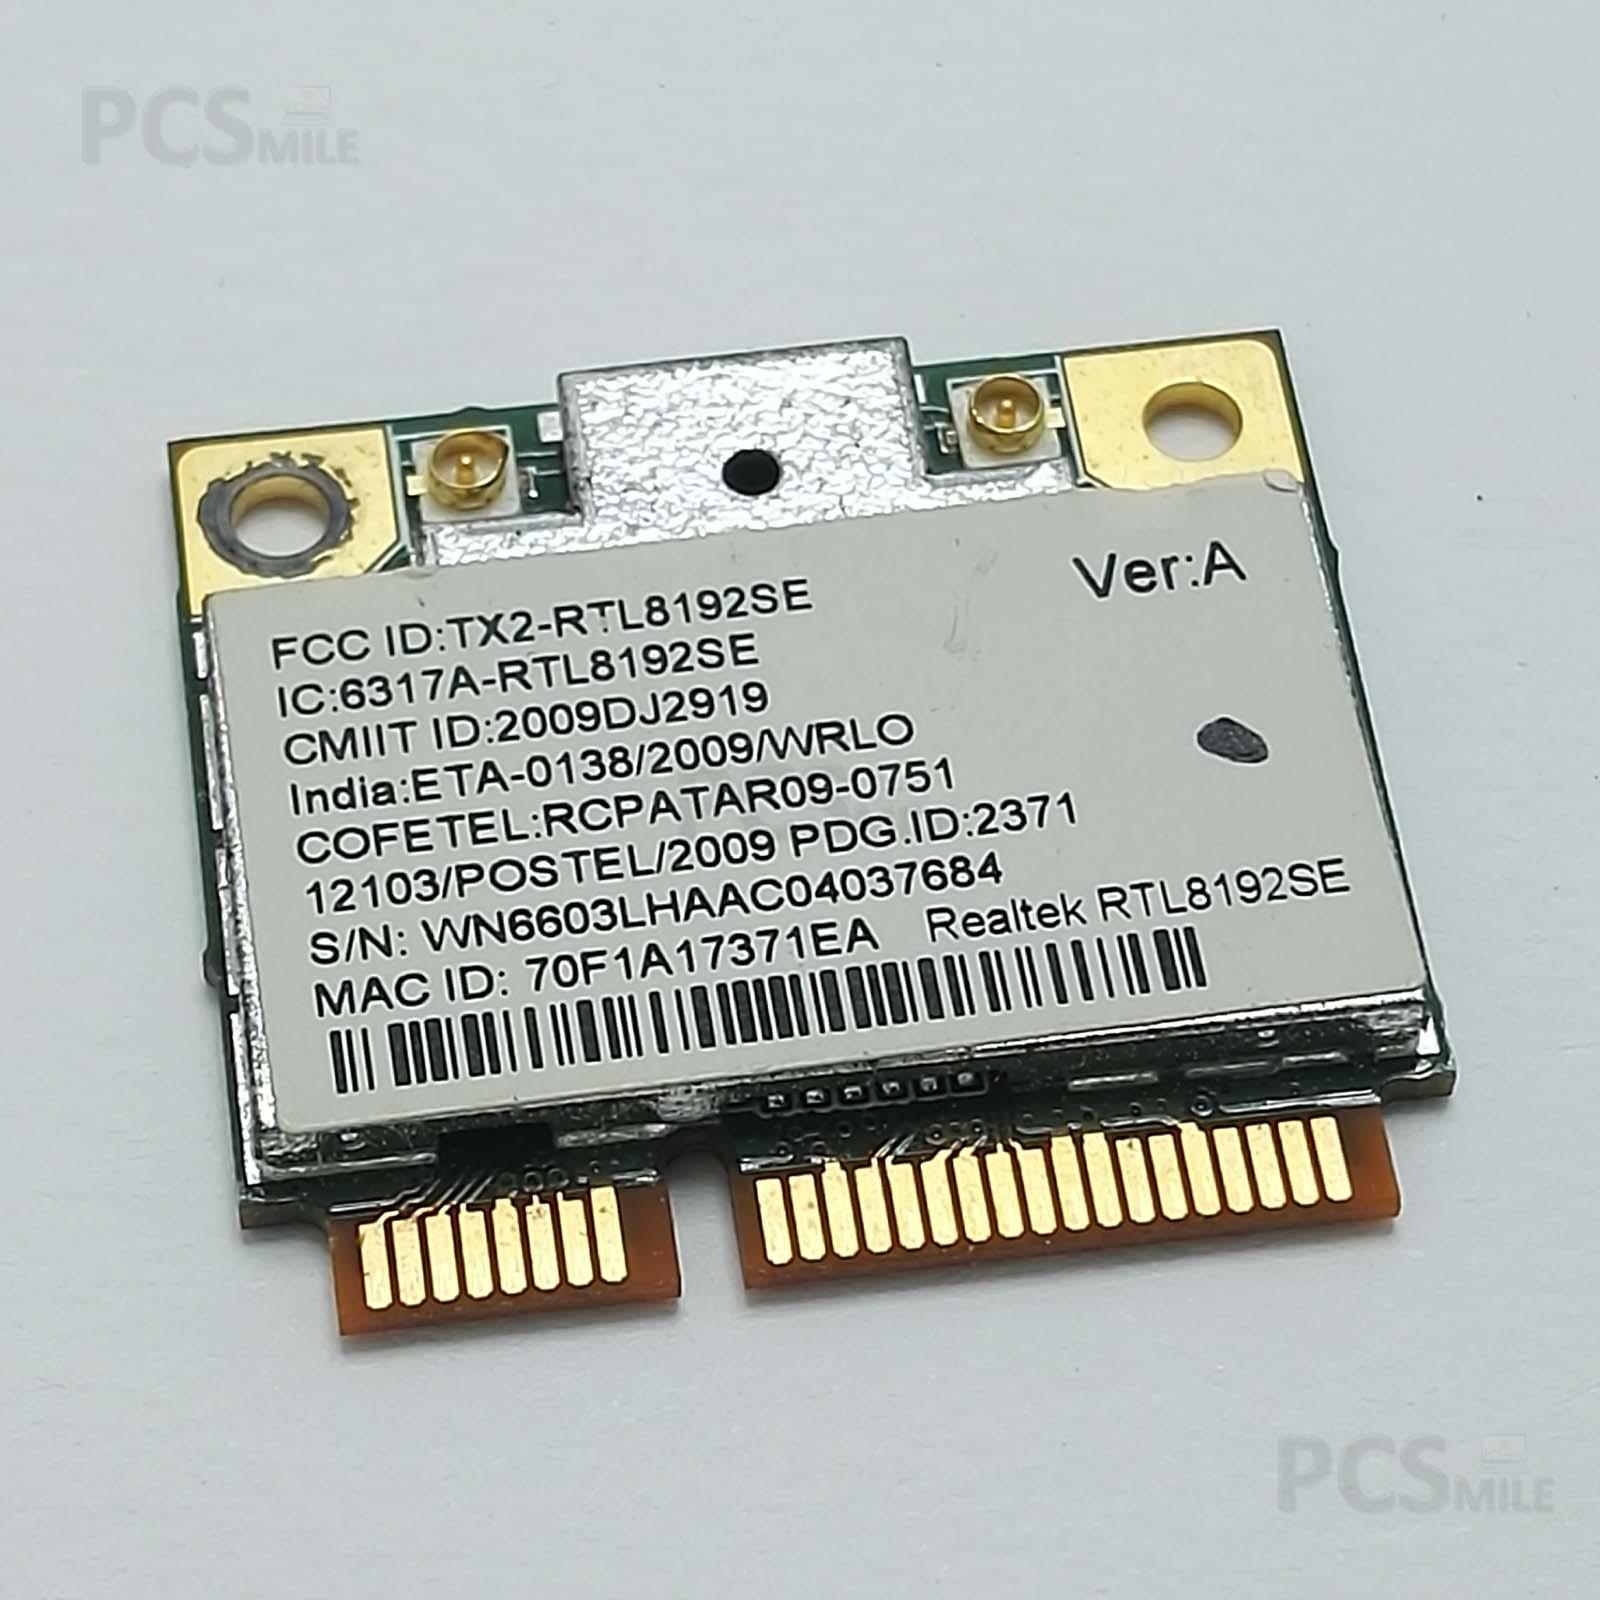 Realtek RTL8192SE Packard bell Acer Toshiba WN6603LH V01 scheda WiFi PCI